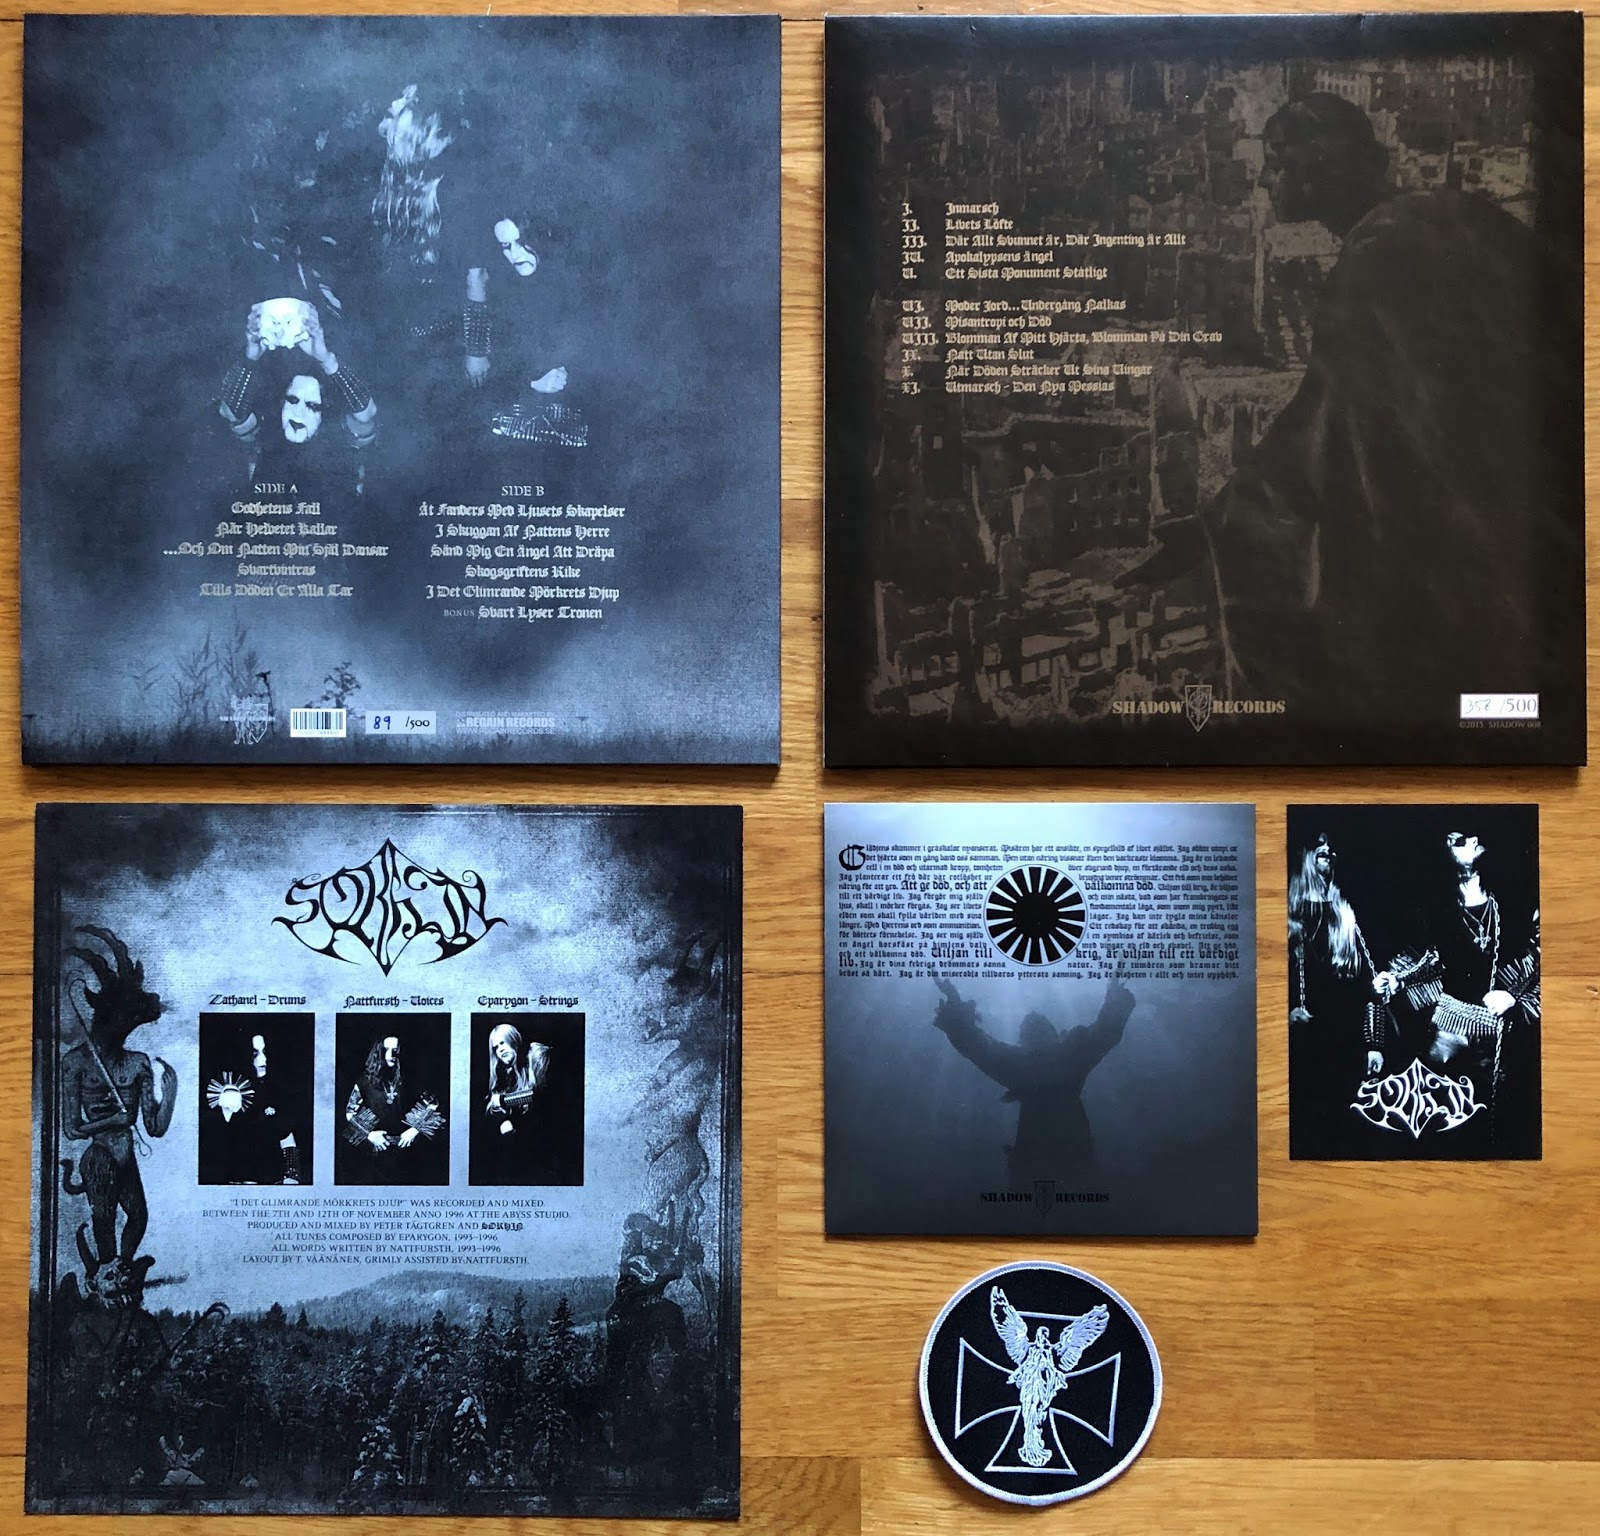 Black/Death/Thrash Metal Blog by Herr Tompa: januari 2019